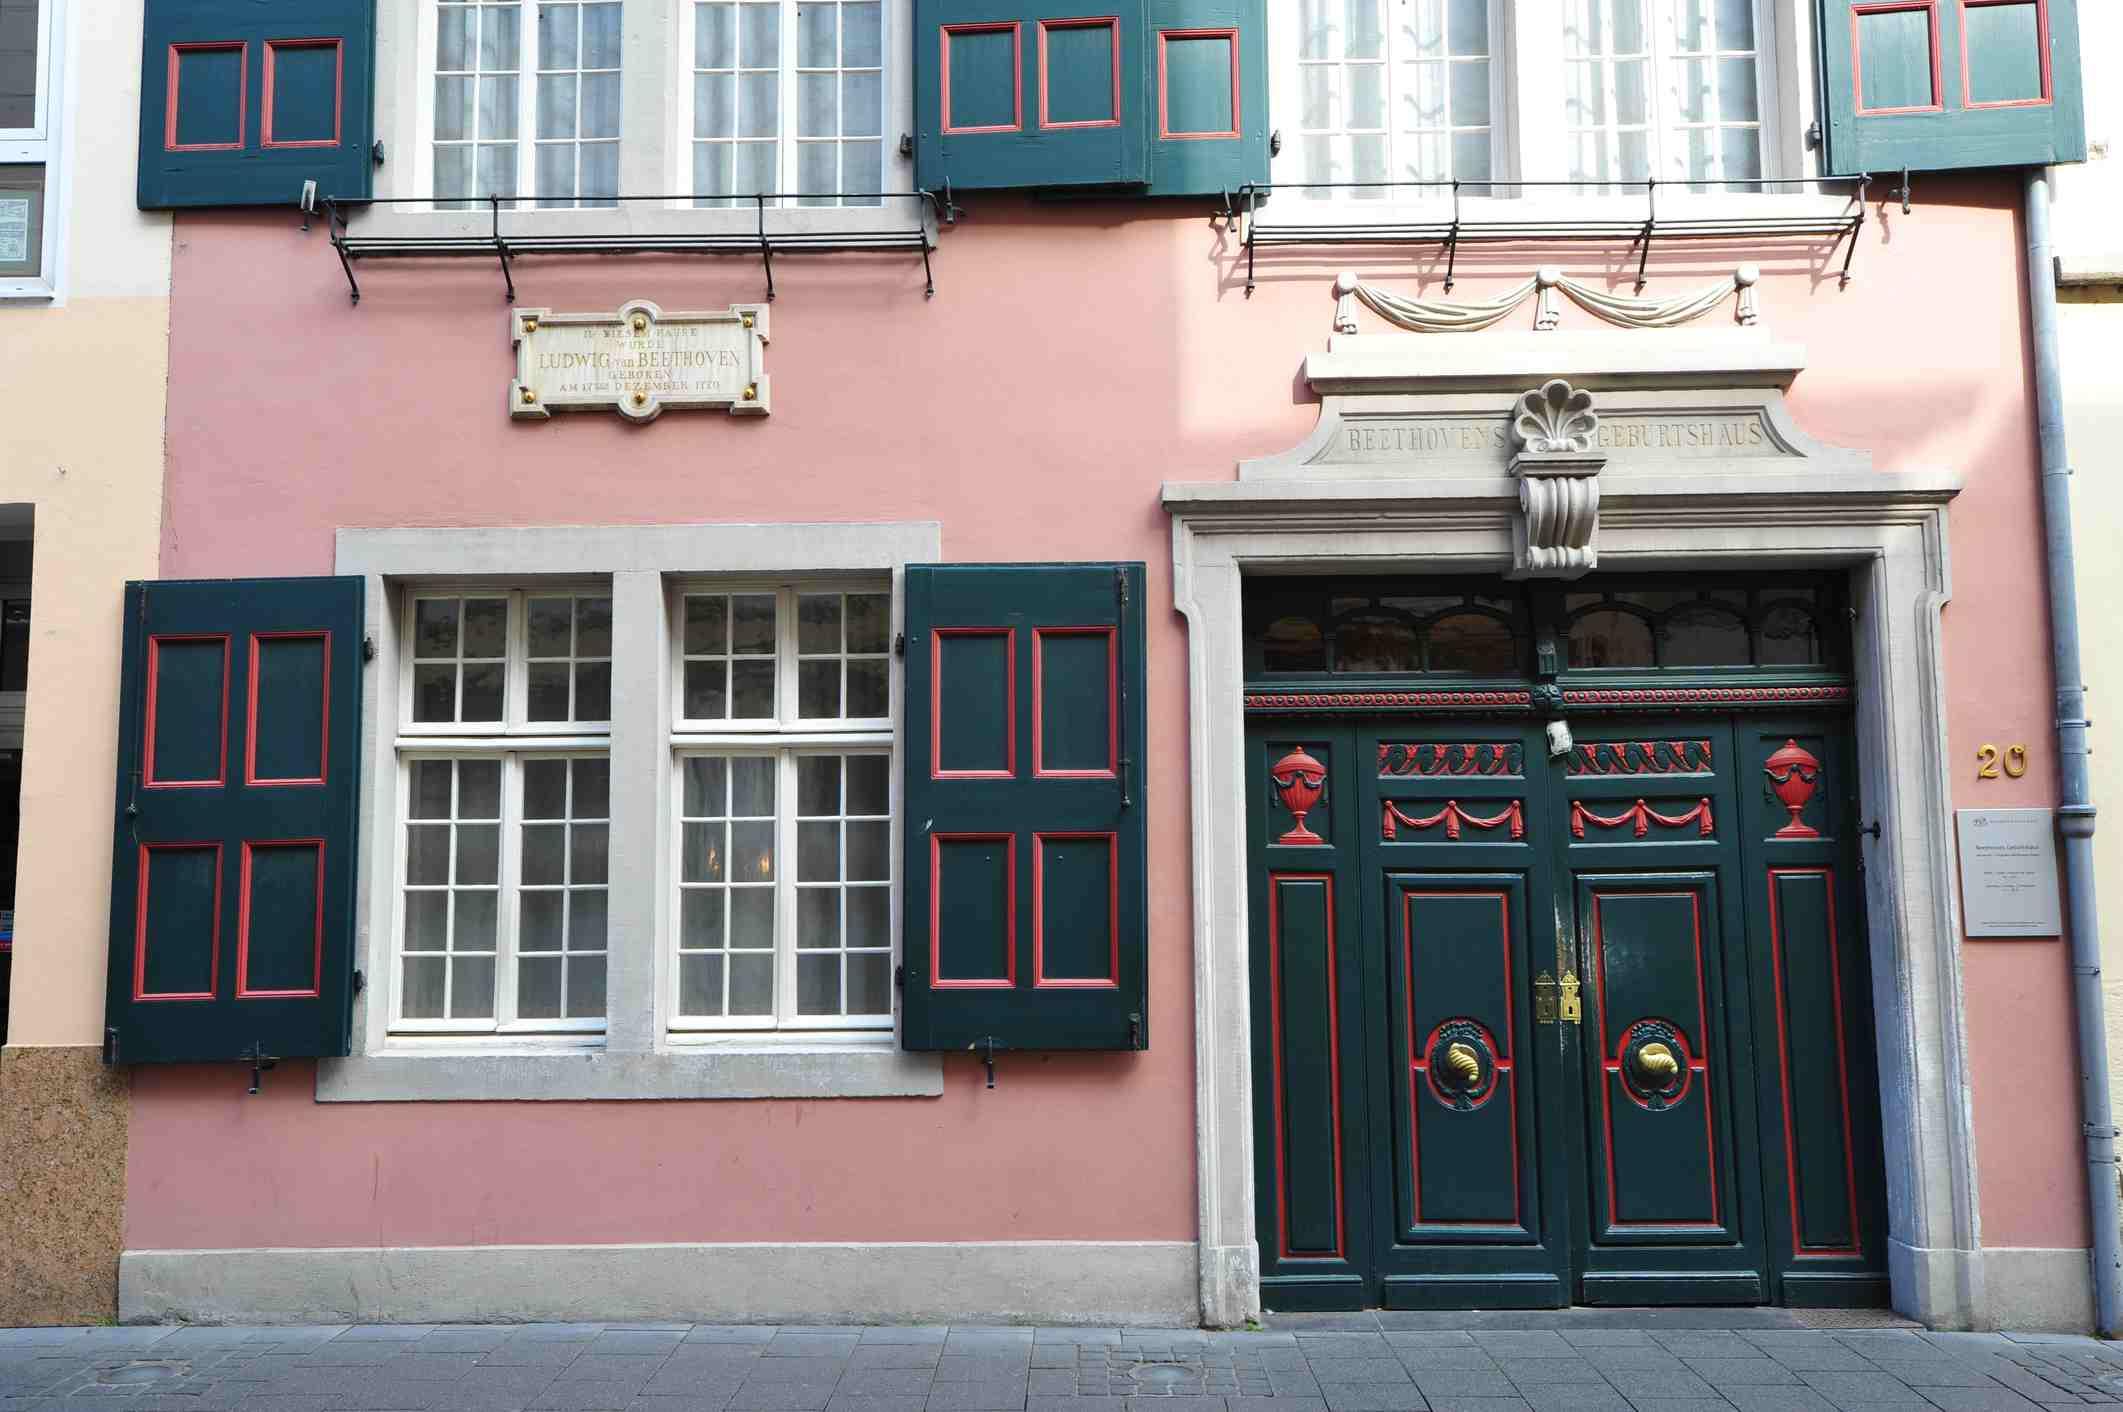 Bonn's Beethoven Haus